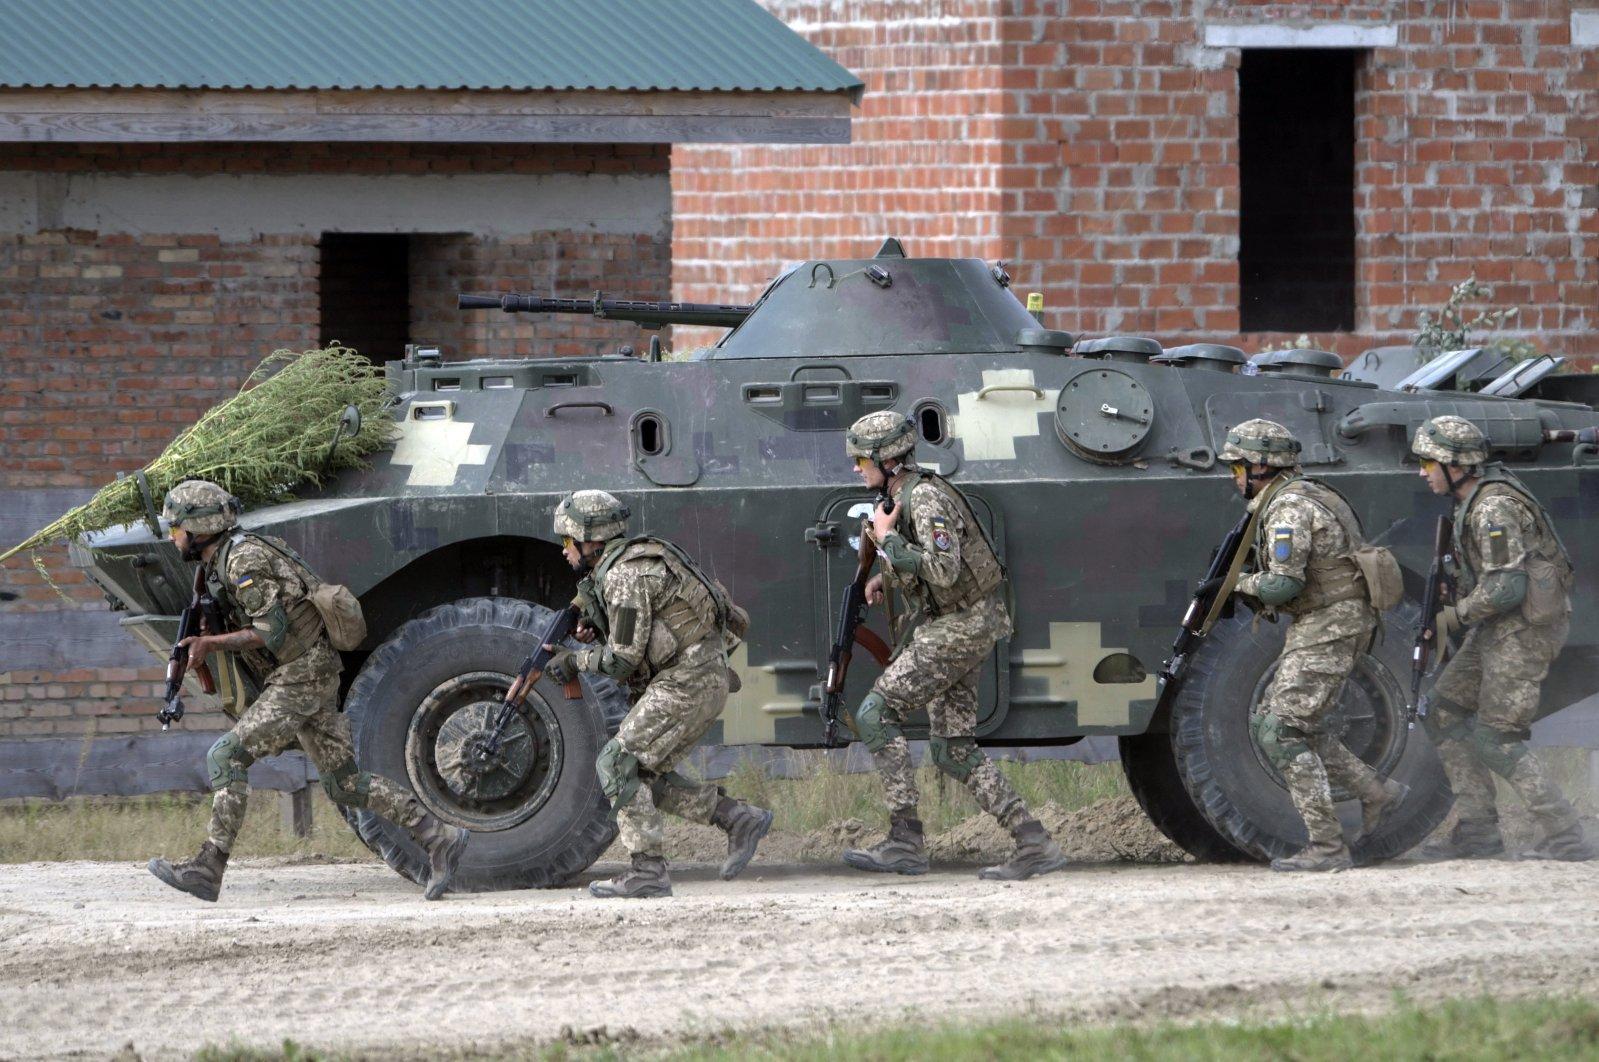 Ukrainian soldiers attend the joint military exercises in Yavoriv training ground, near the western Ukrainian city of Lviv, Ukraine, Sept. 17, 2020. (EPA Photo)